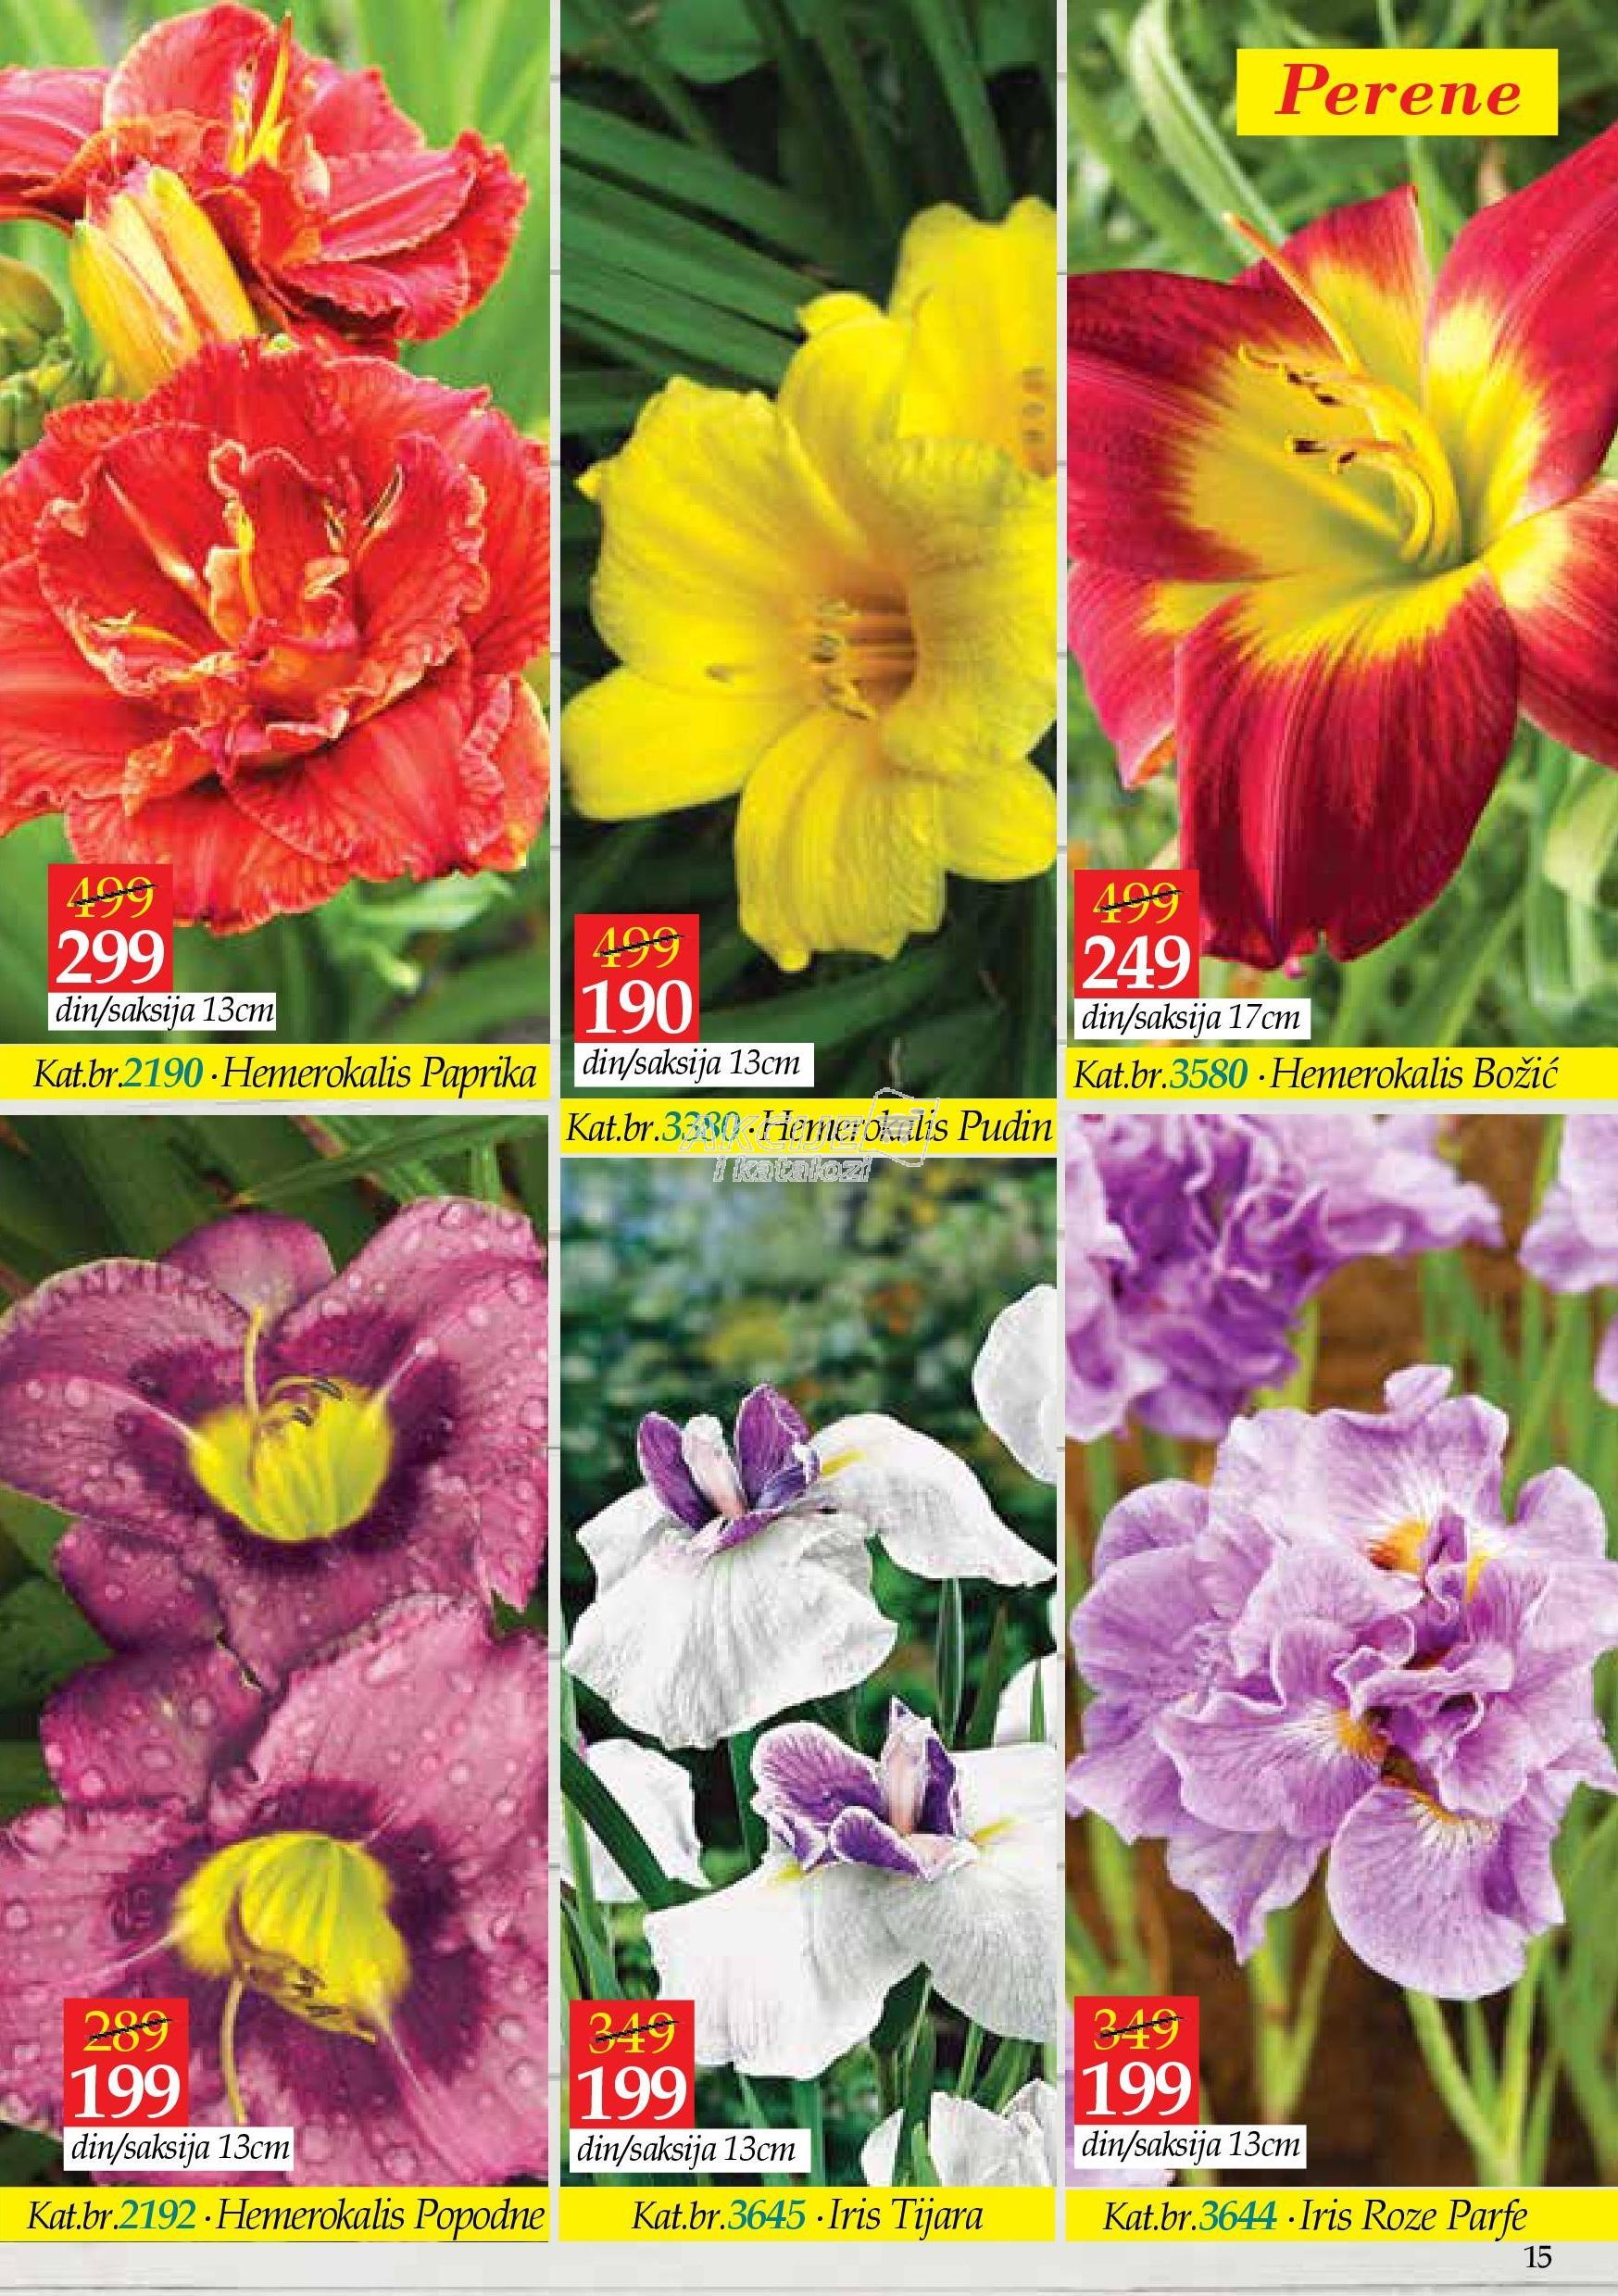 Flora Ekspres akcija letnje kupovine